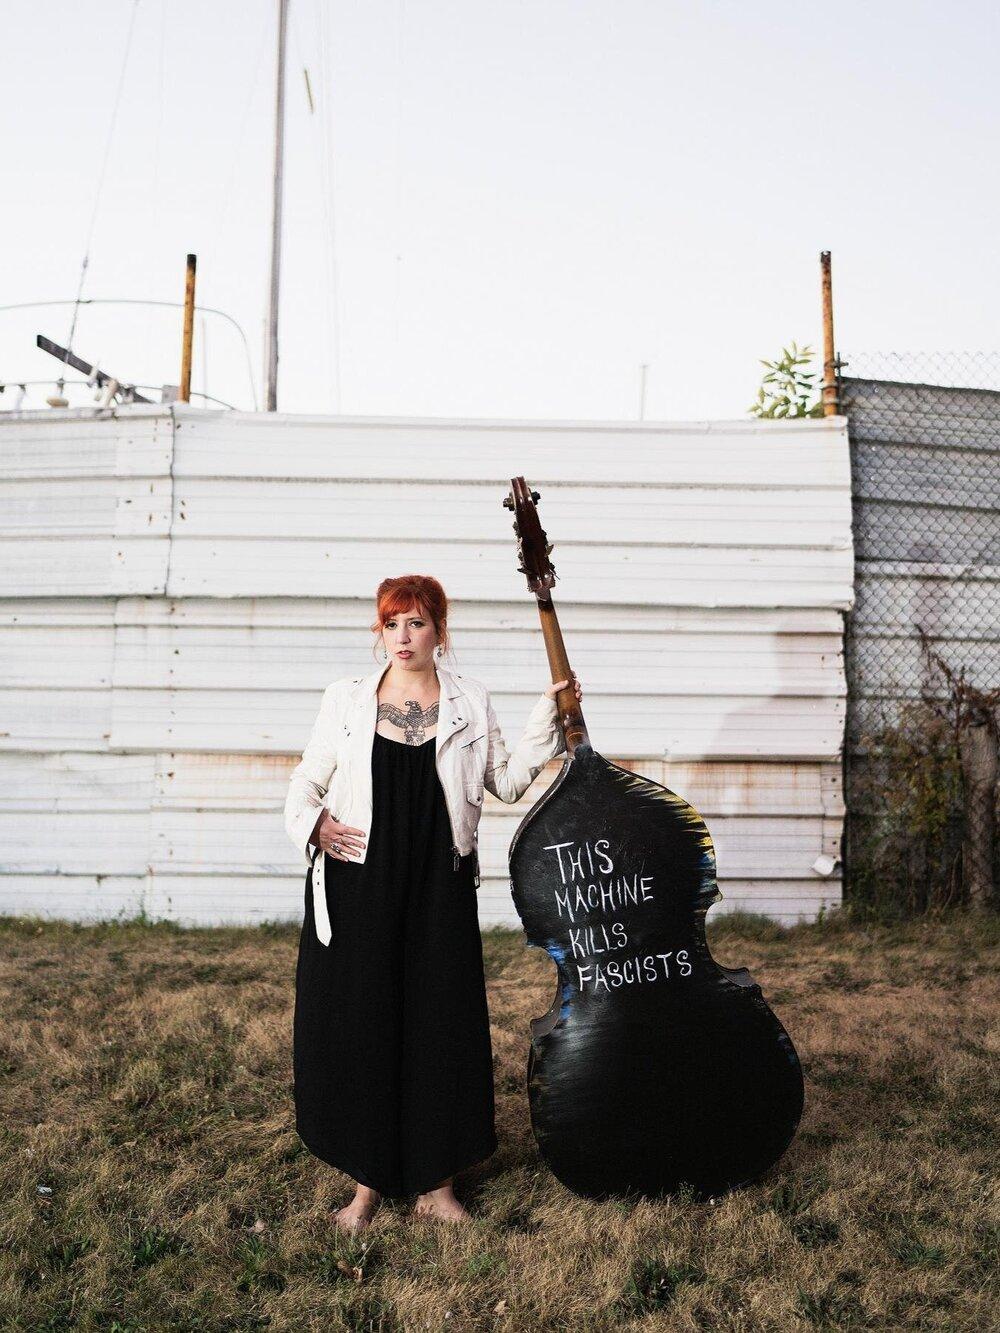 Musician, Johanna Rose